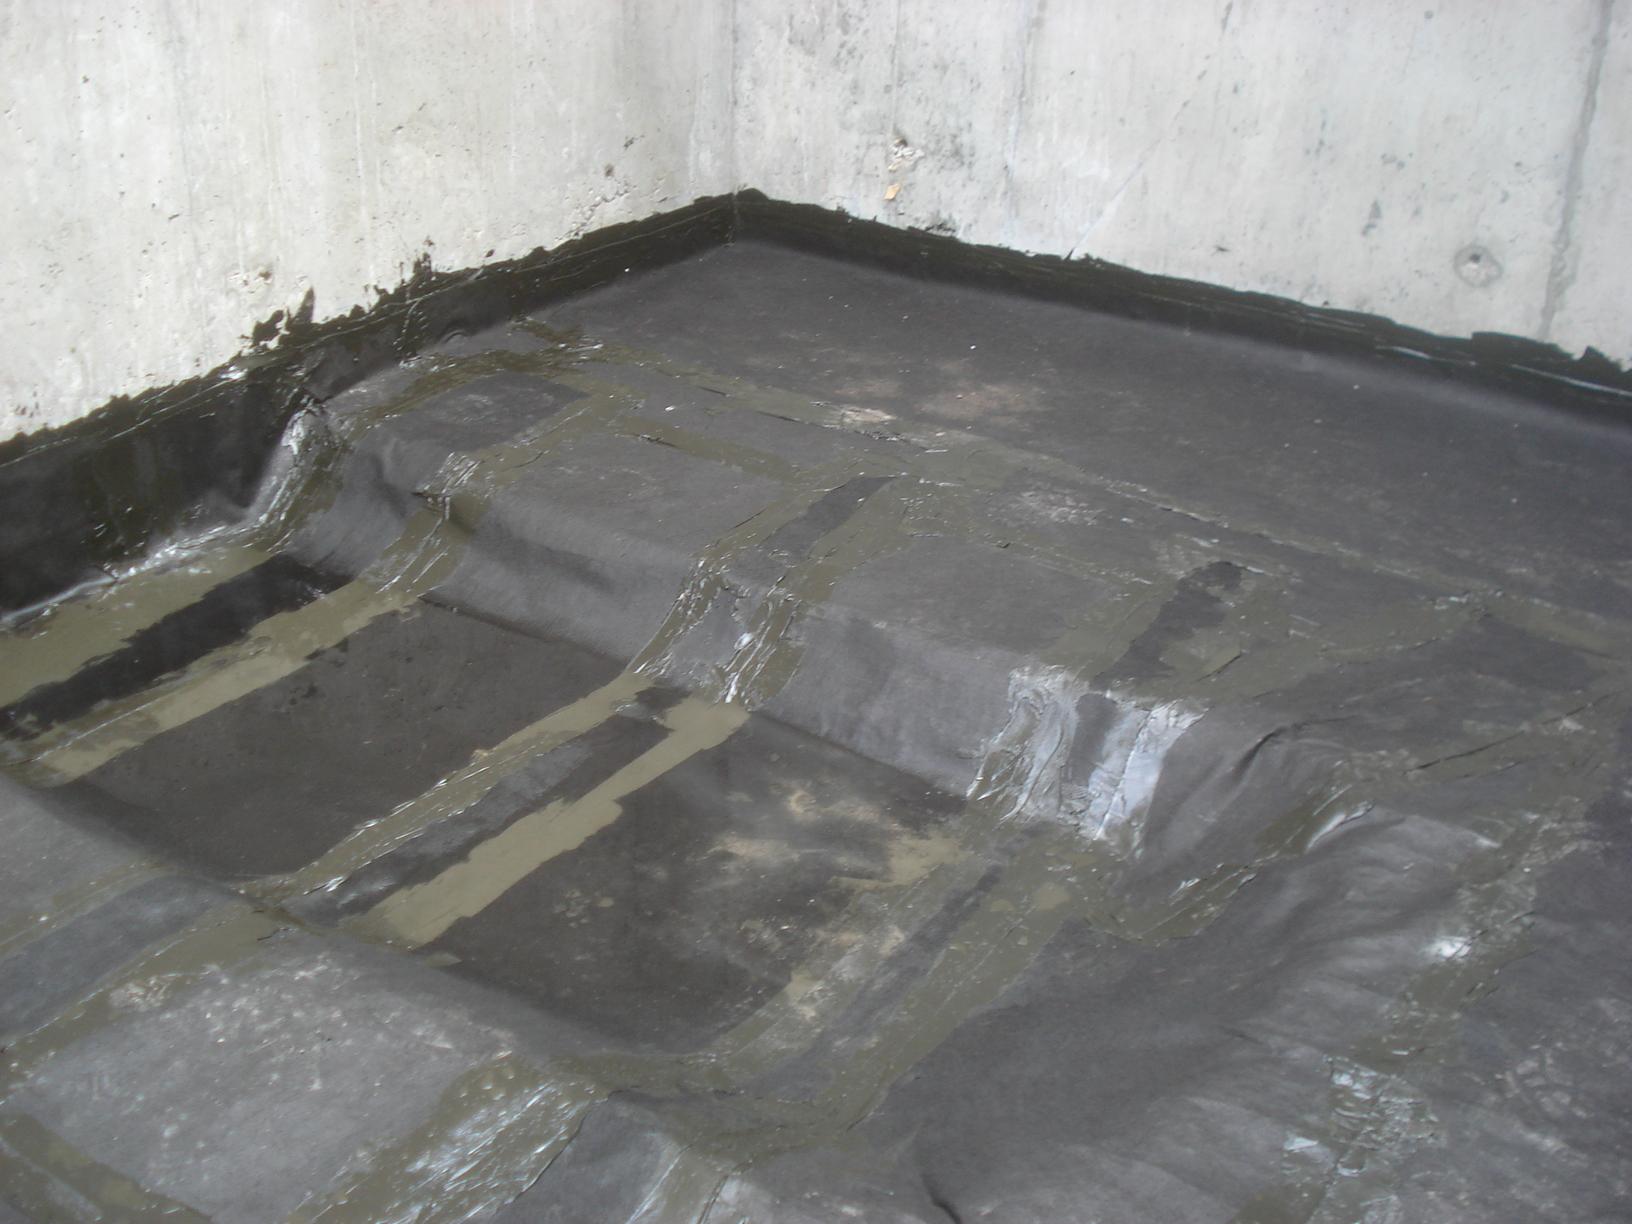 Rock Solid Concrete >> Canada's Dry| Concrete Construction Magazine | Waterproofing, W.R. Meadows Inc